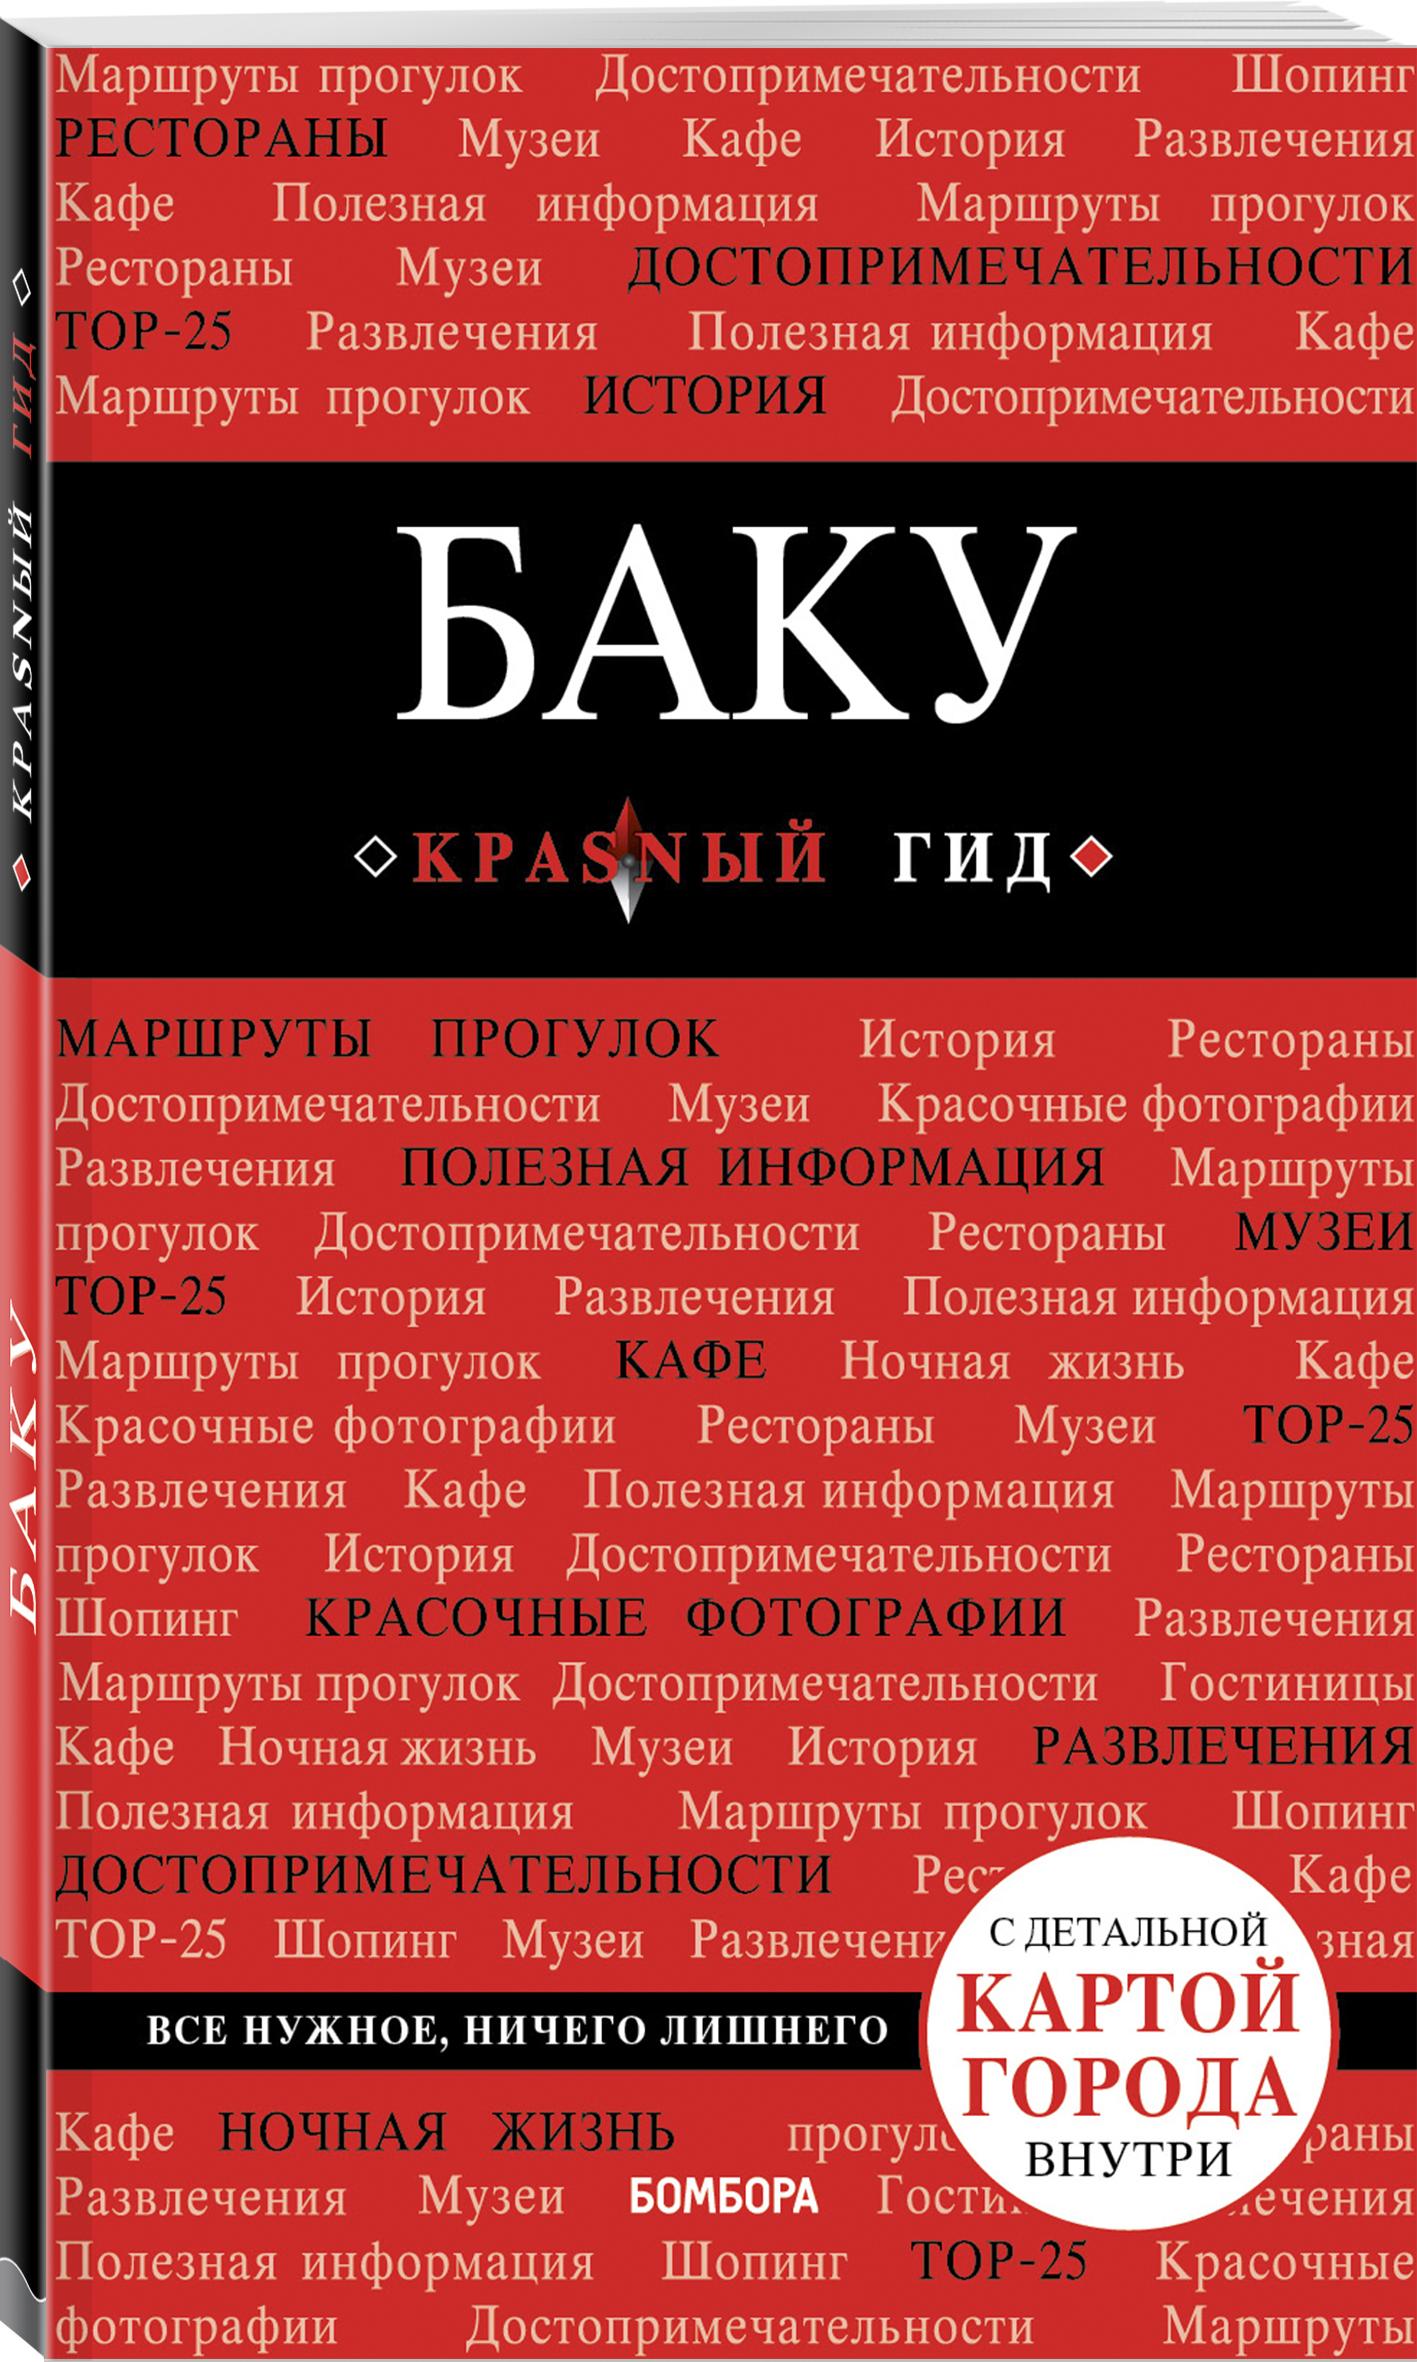 Баку: путеводитель + карта